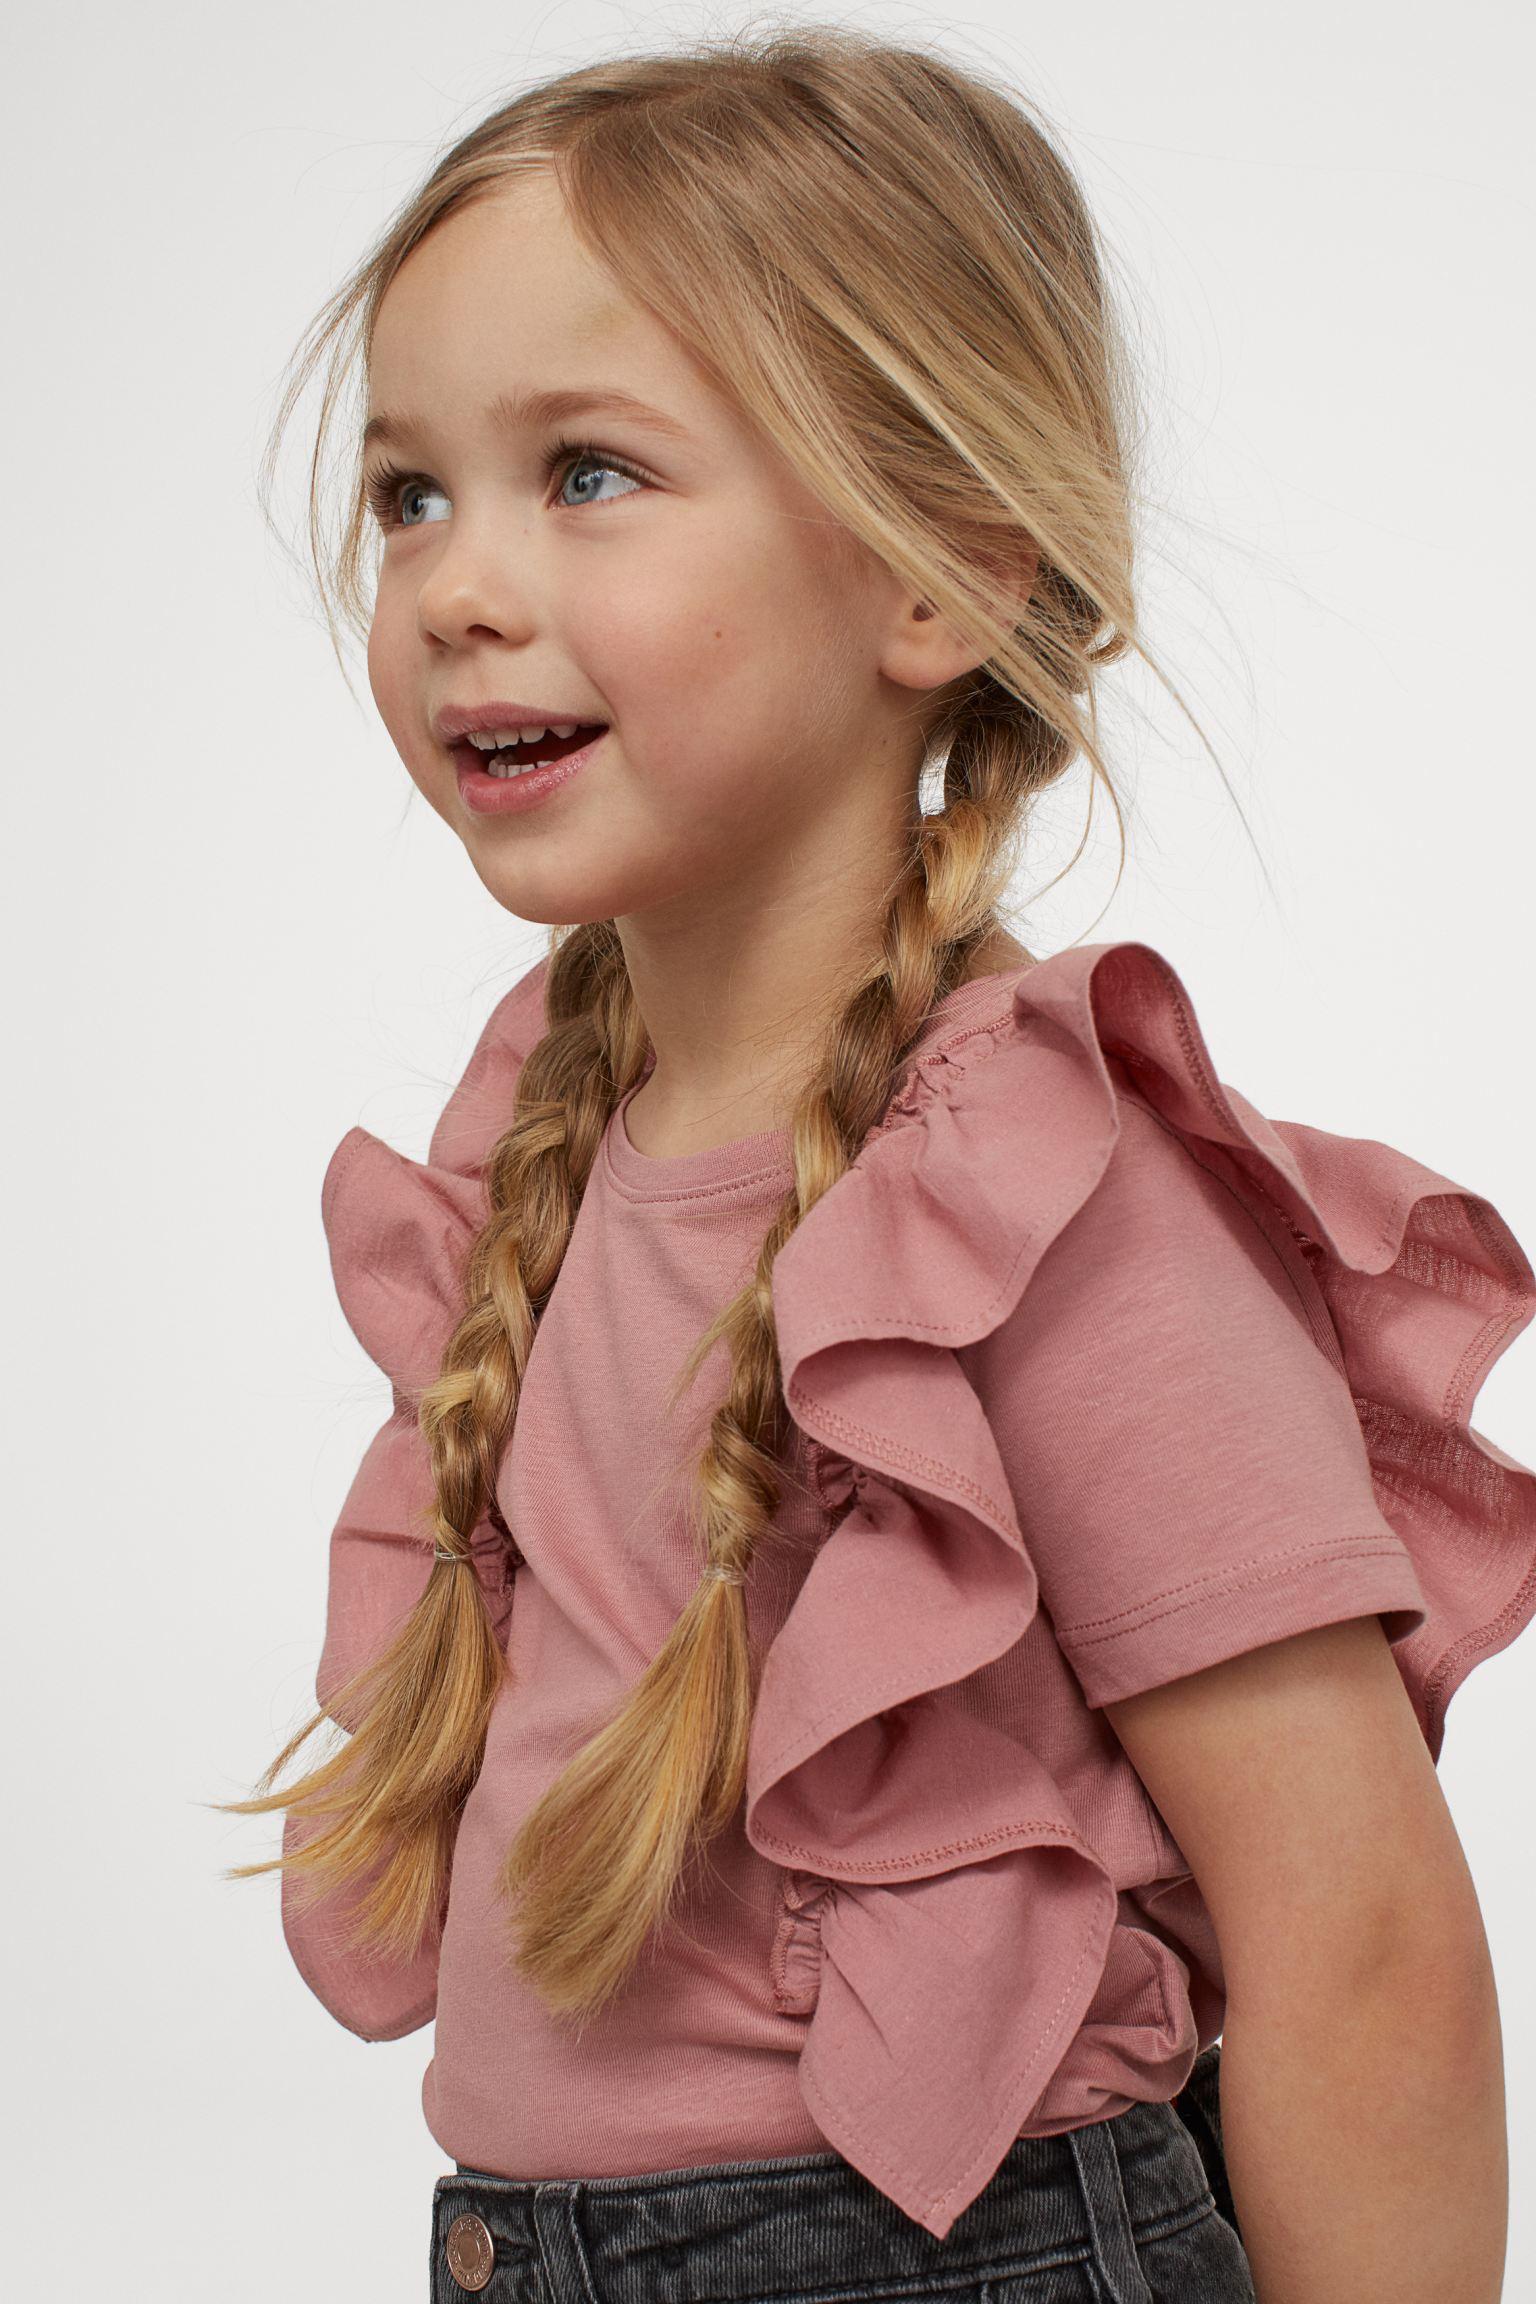 H&M Kids Ruffle-Trimmed Cotton Top